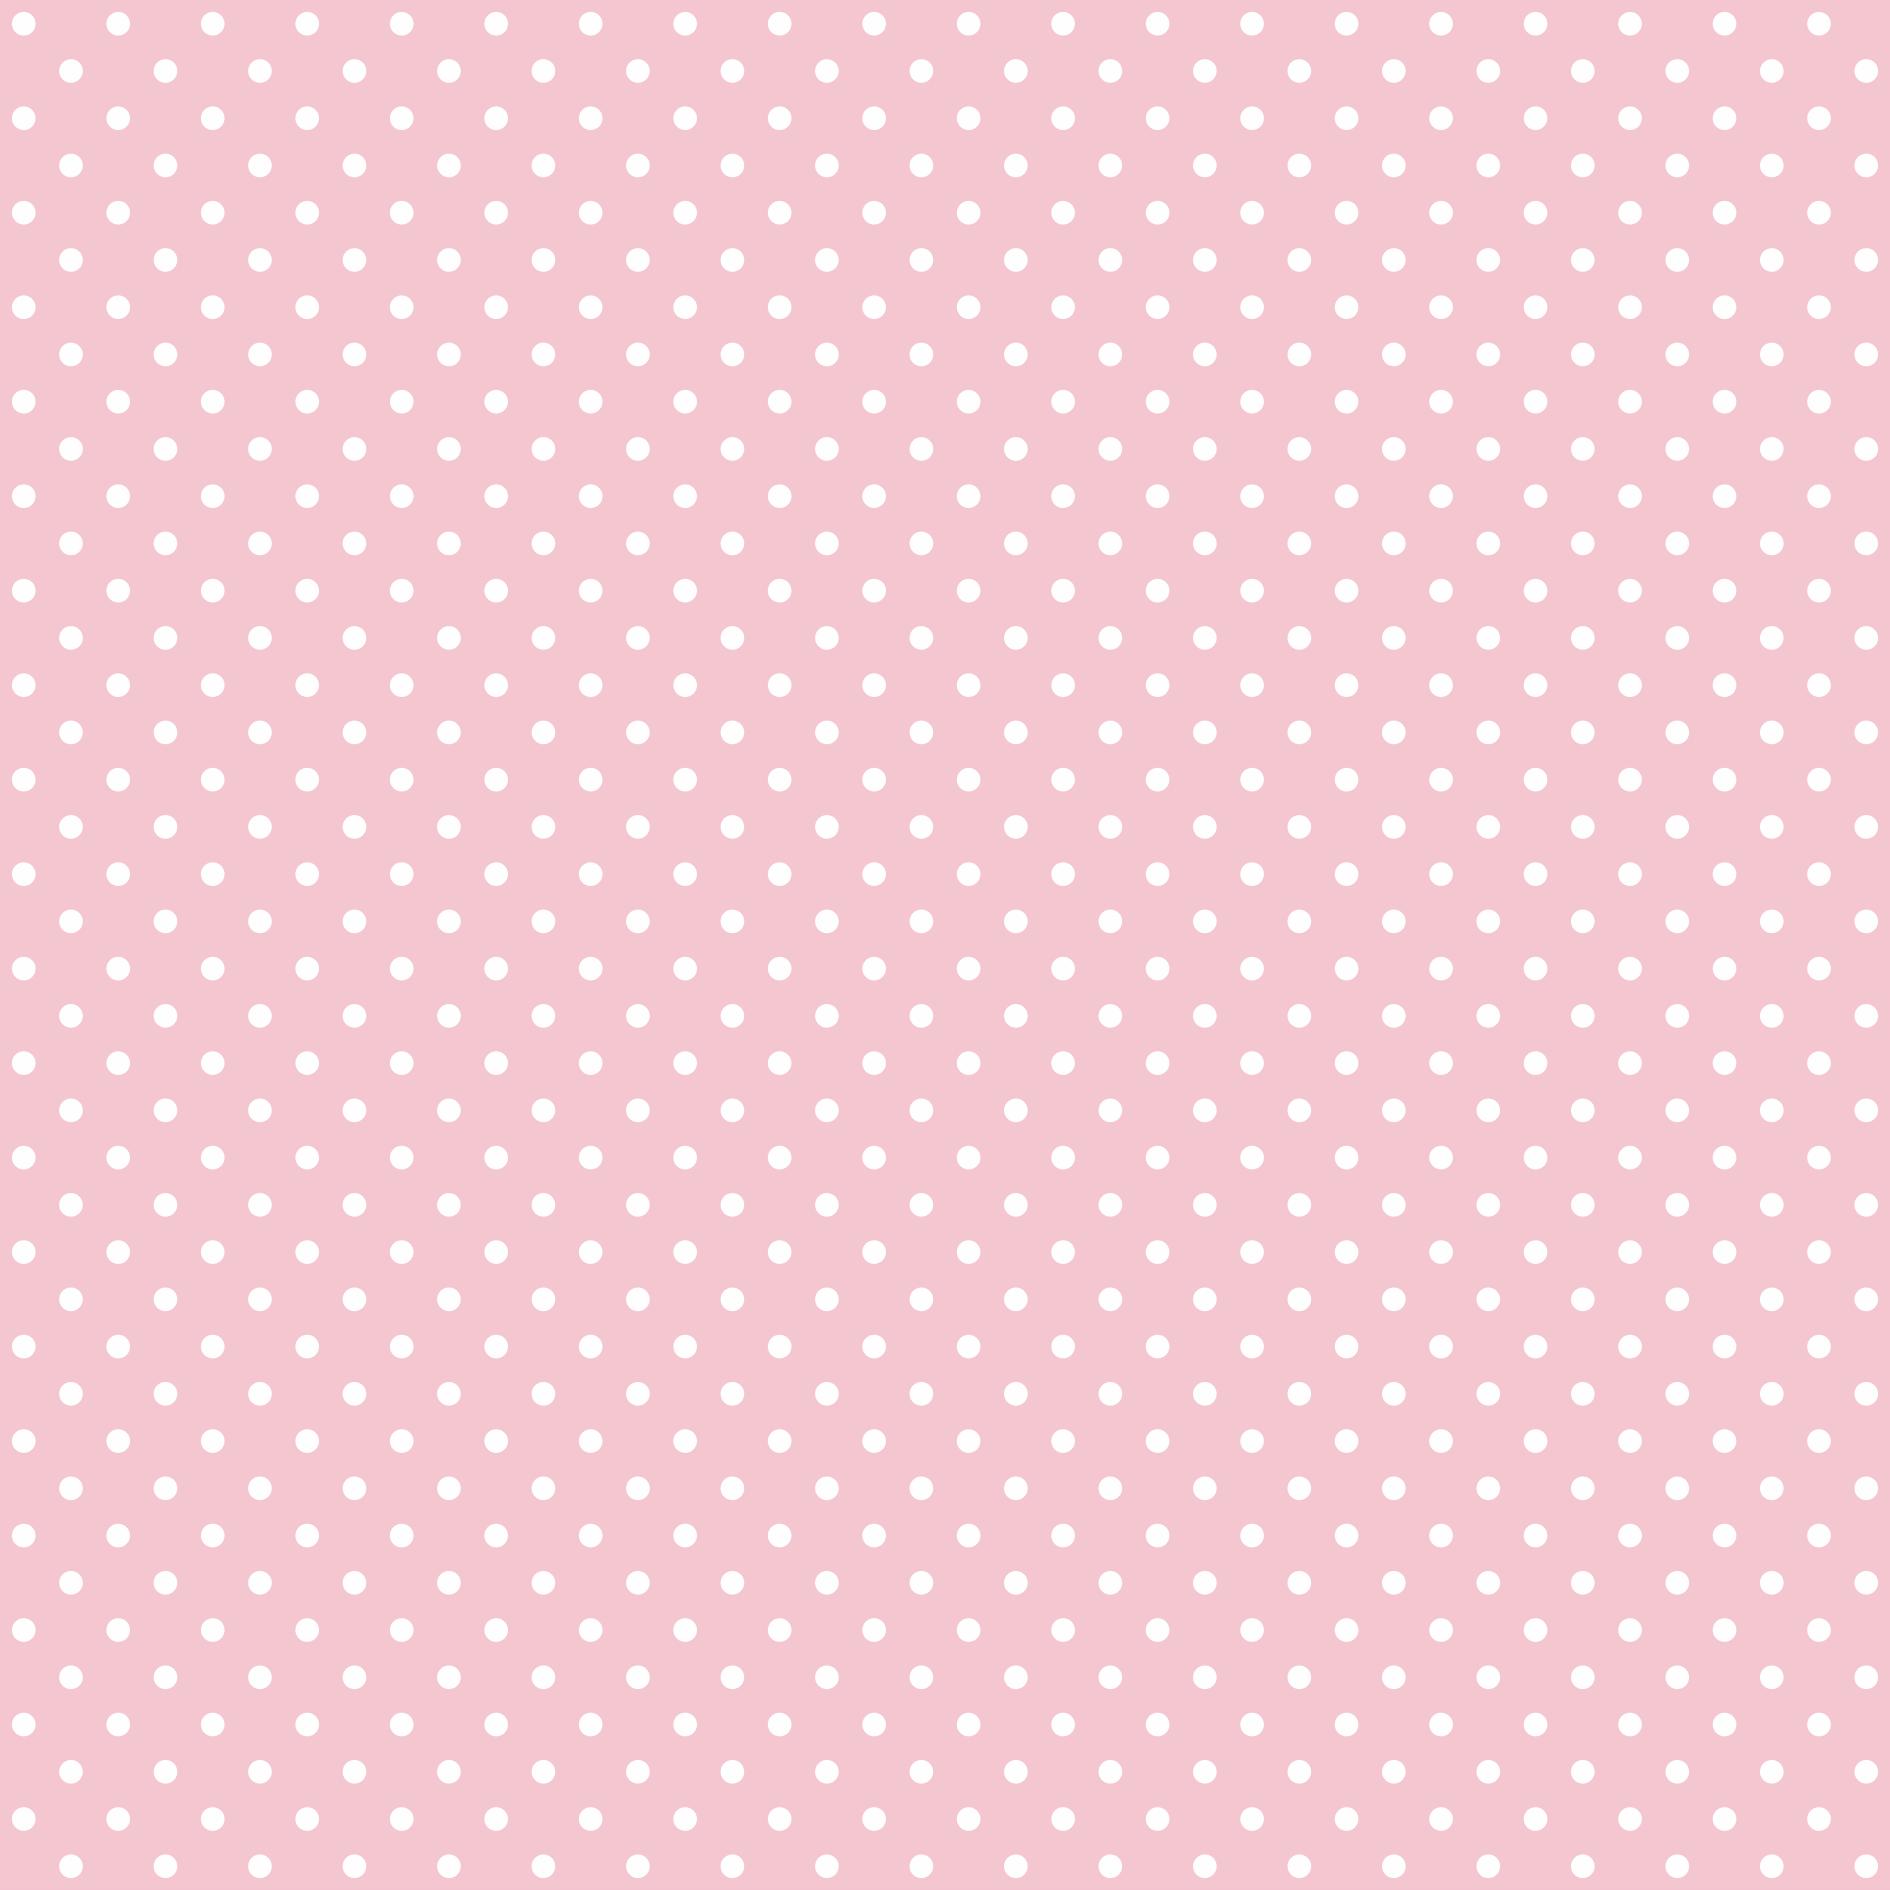 Tecido Tricoline estampado Poá branco fundo rosa